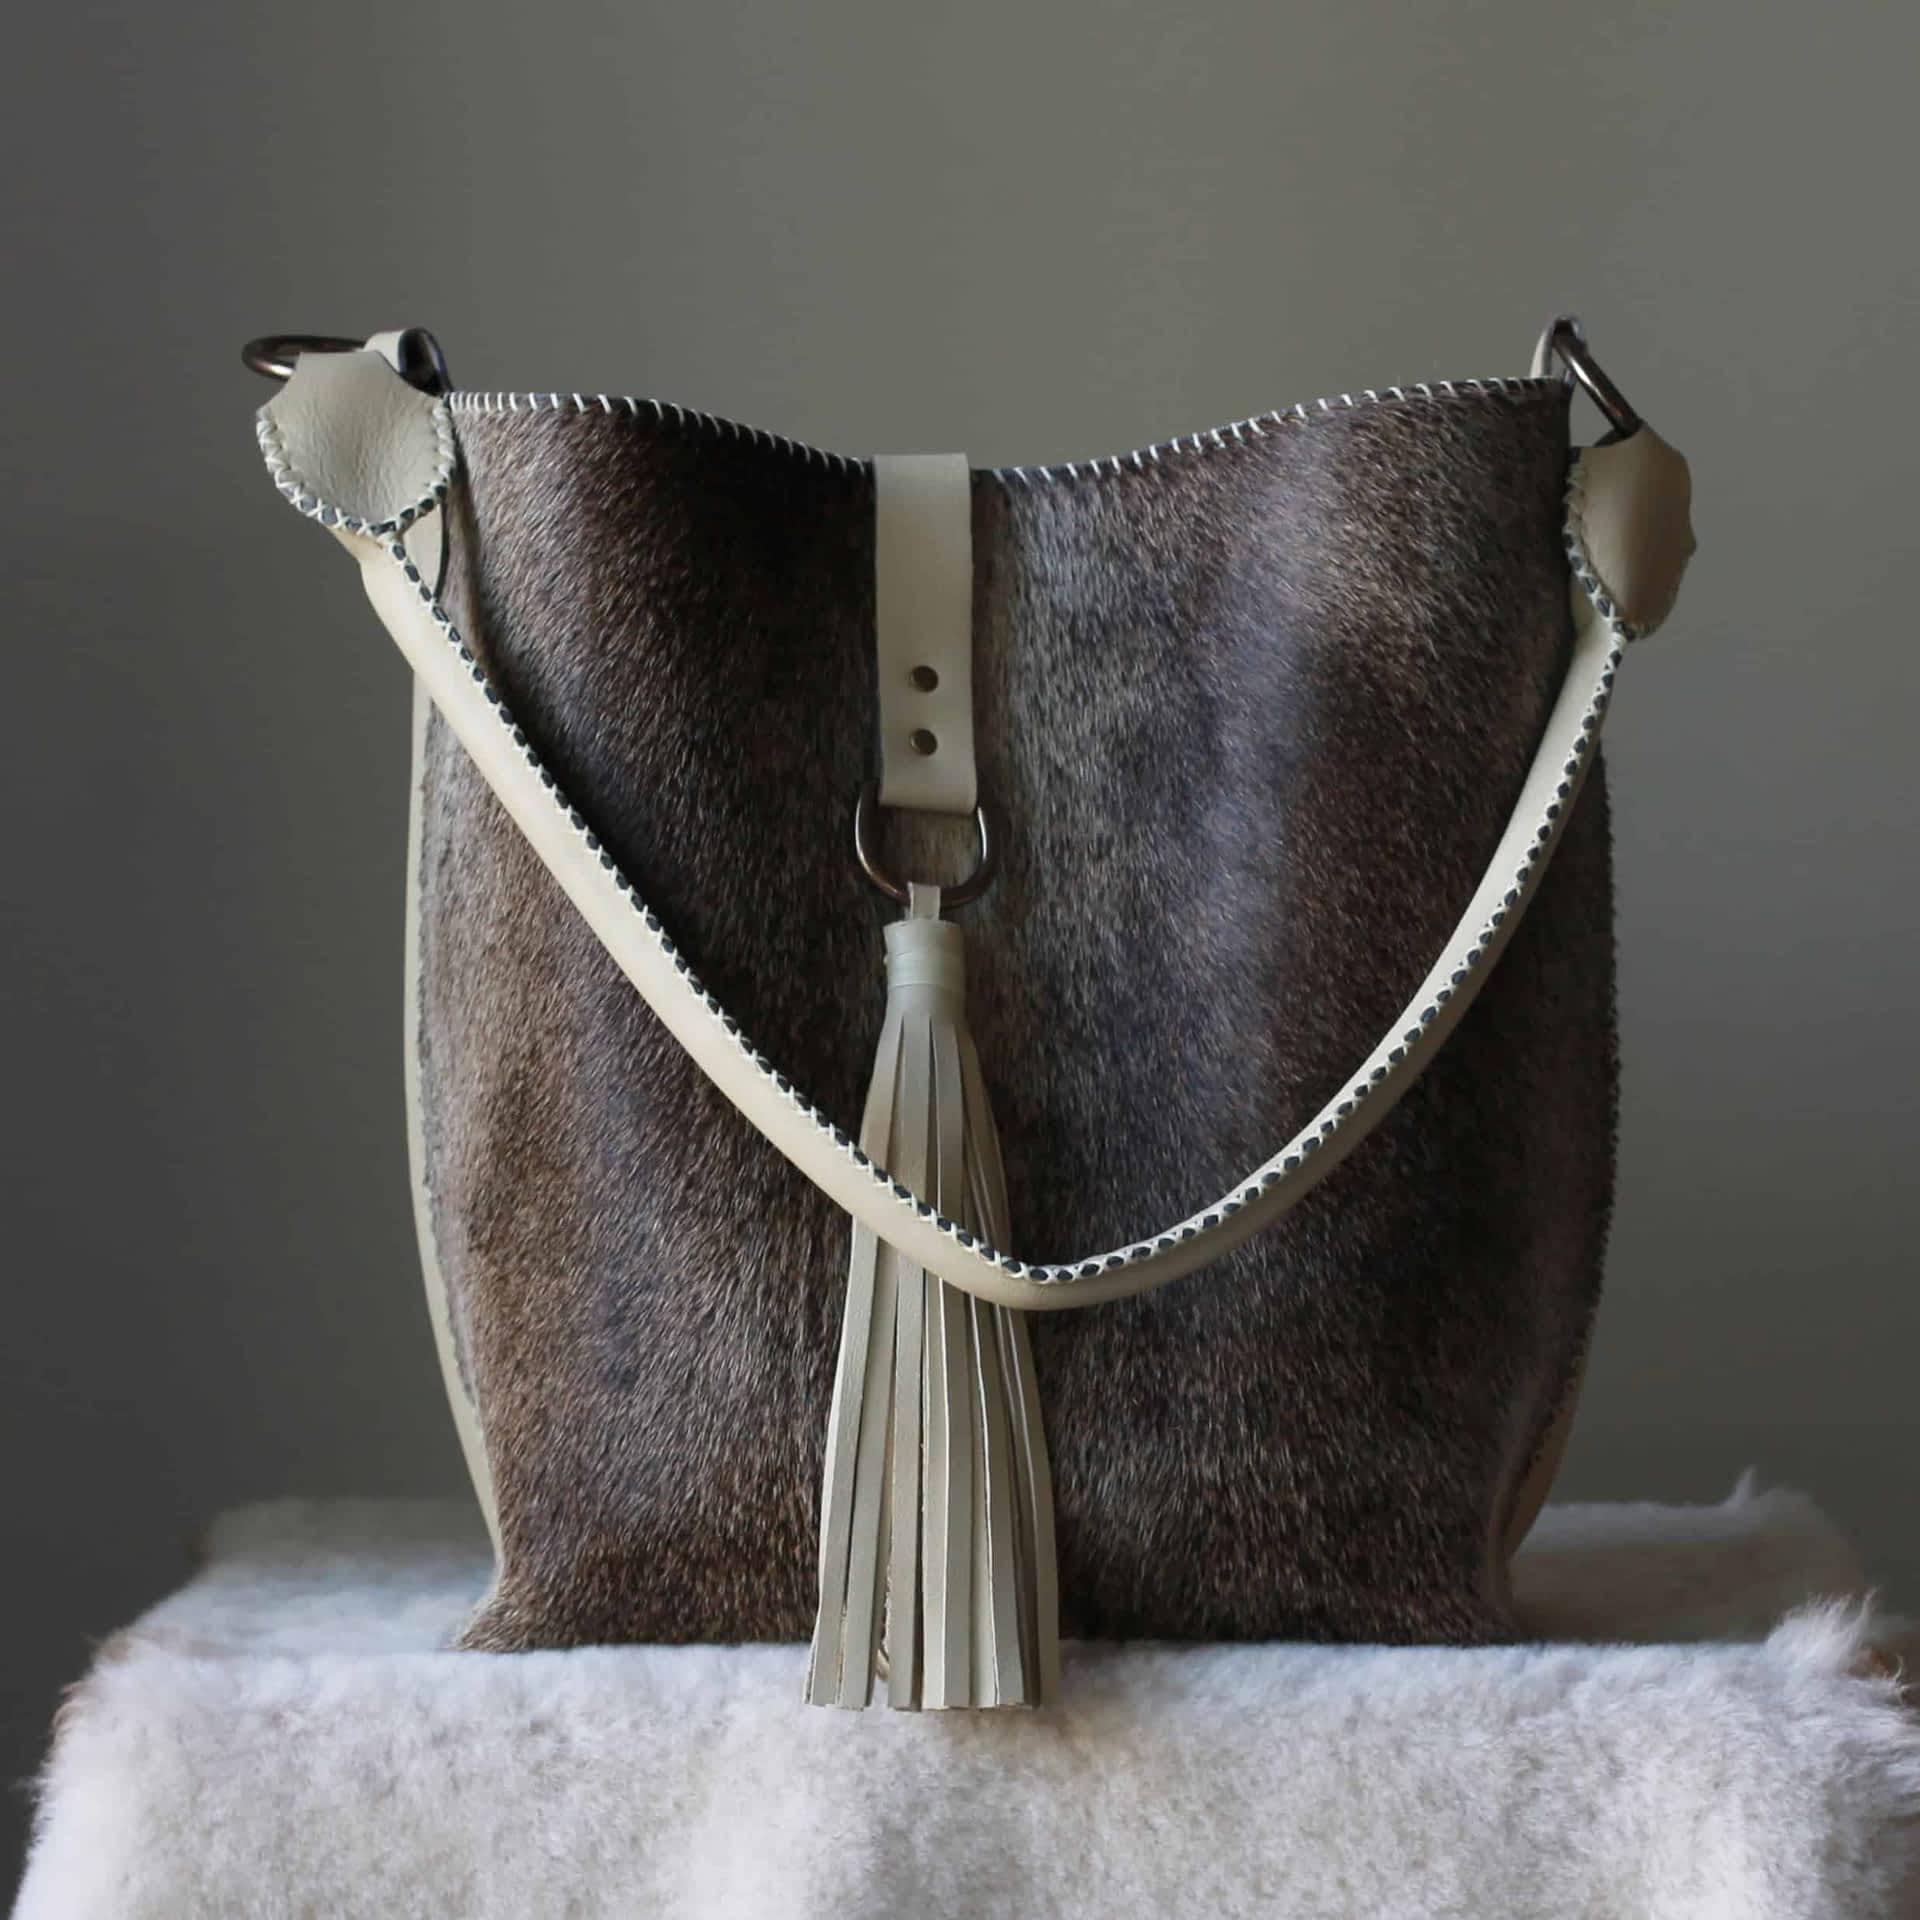 Handbag - Clothing